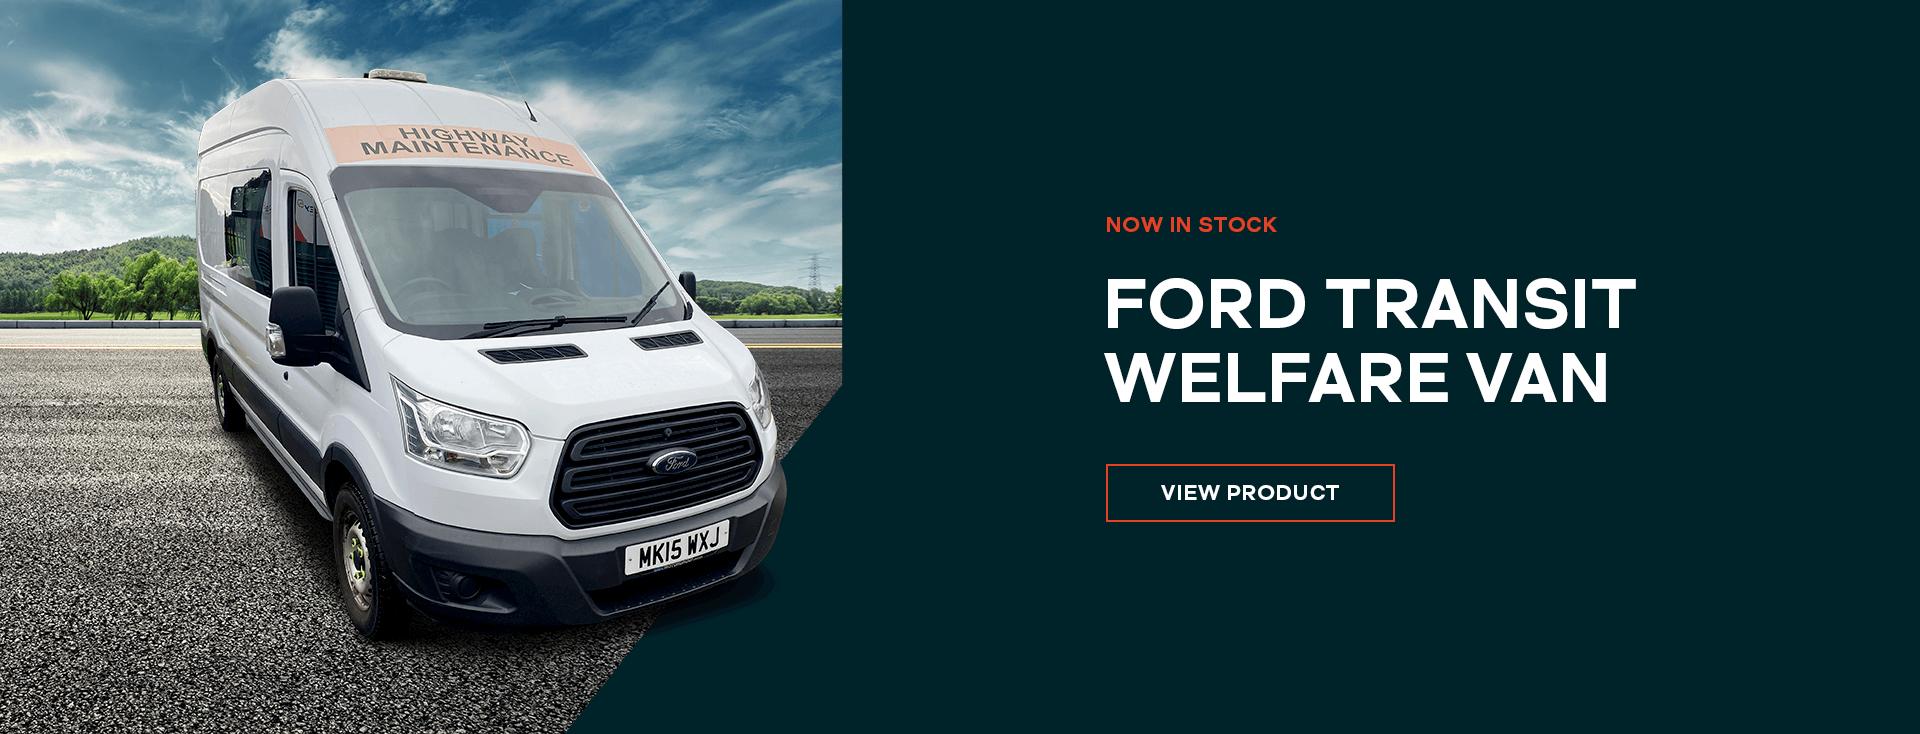 Ford Transit Welfare Van